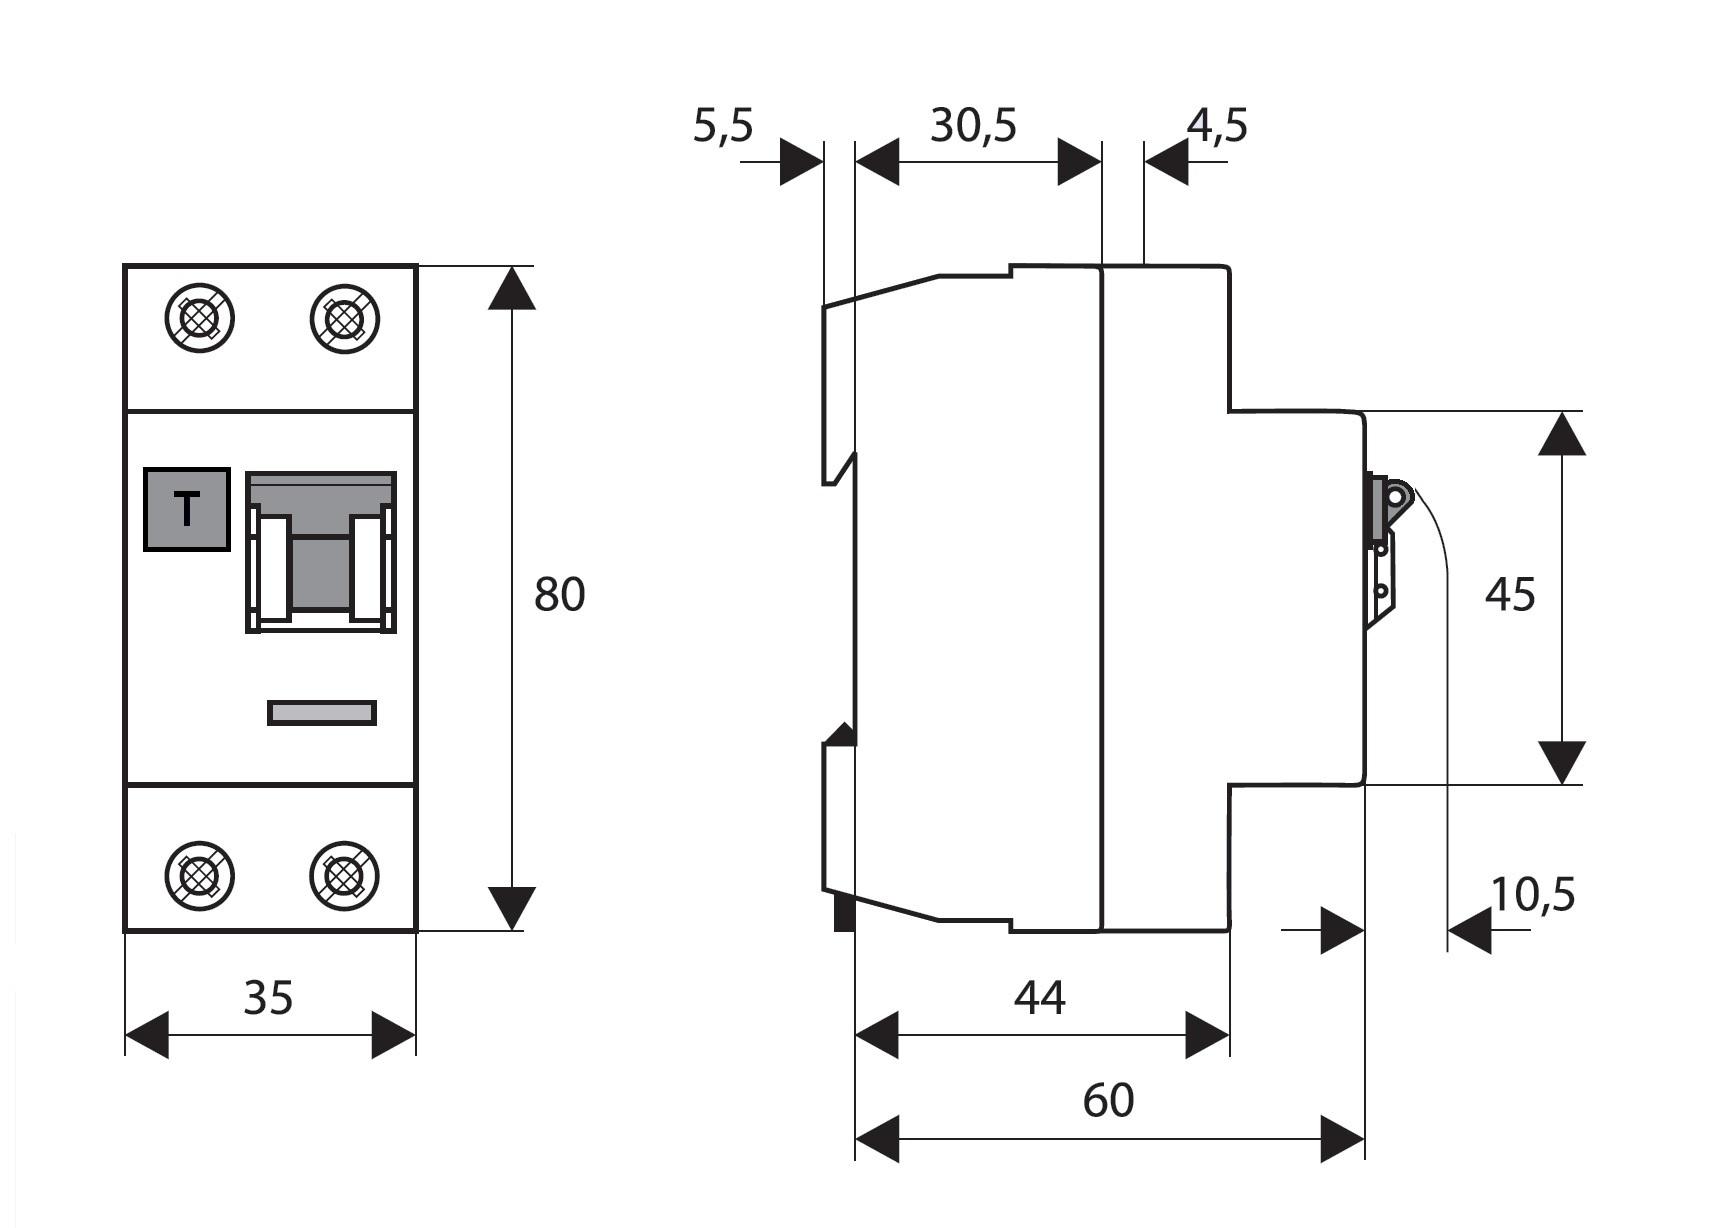 Elektro Austria - FI-Schalter, 25A, 2-polig, 30mA,Bauart G, Typ AC